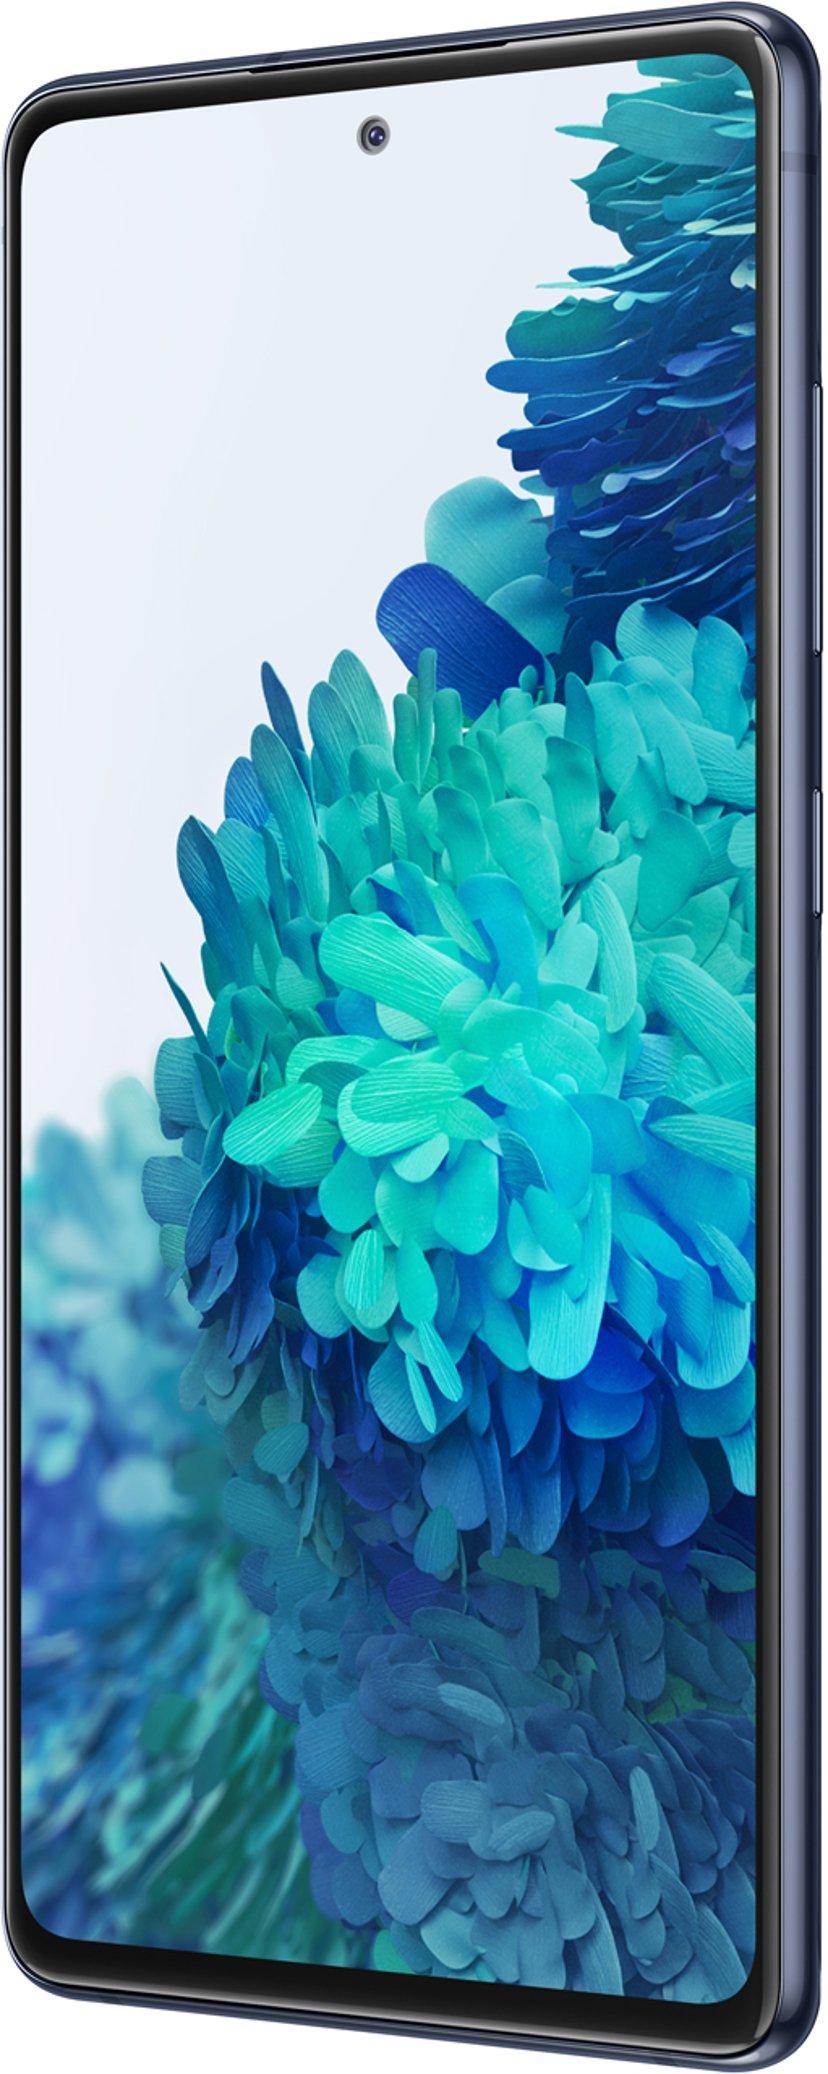 Samsung Galaxy S20 FE 5G 128GB Dobbelt-SIM Skymarineblå